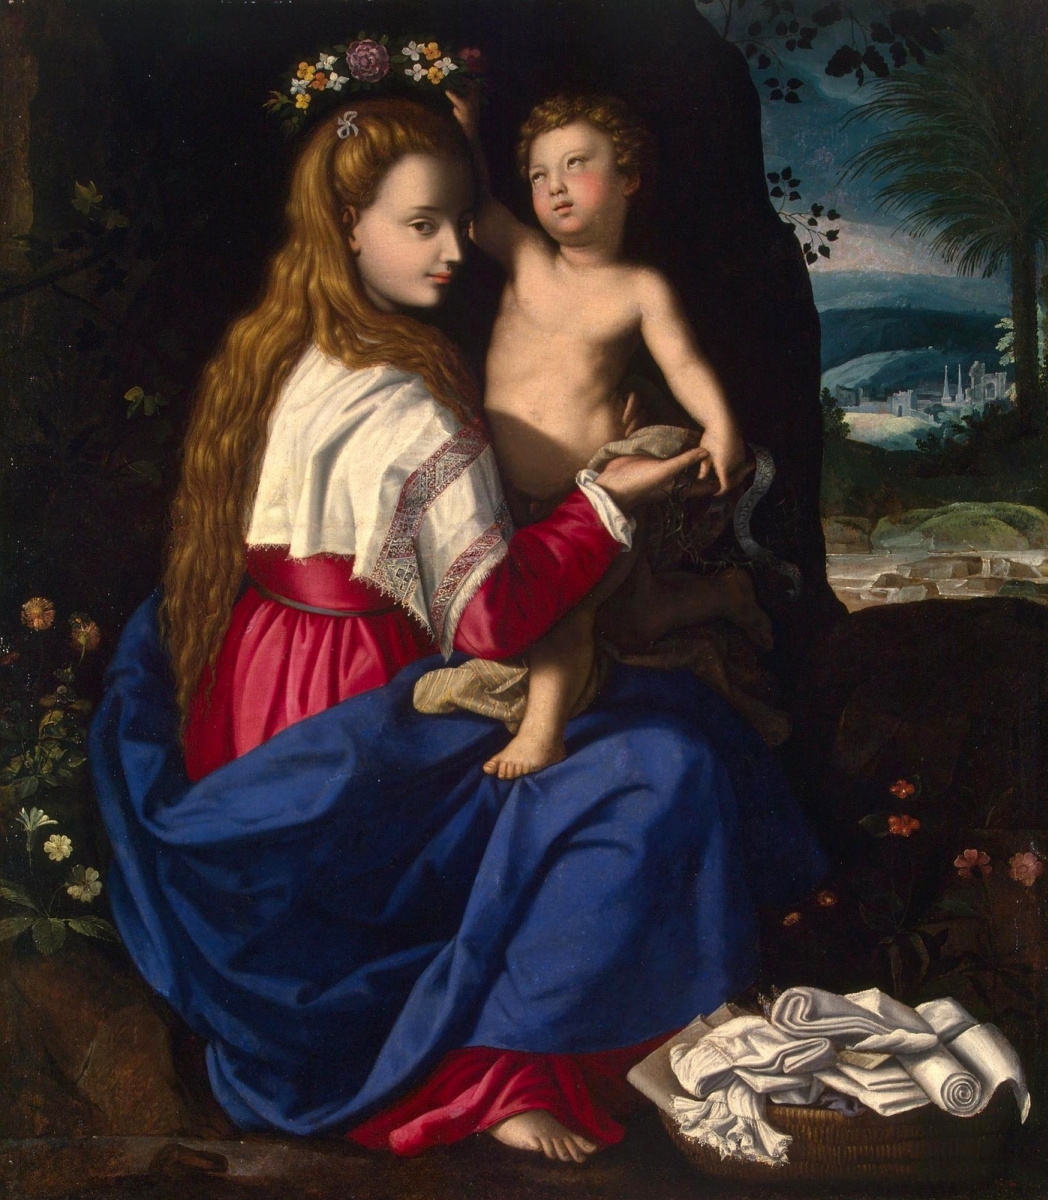 Alessandro Allori. Allegory of the Christian Church. 1600s